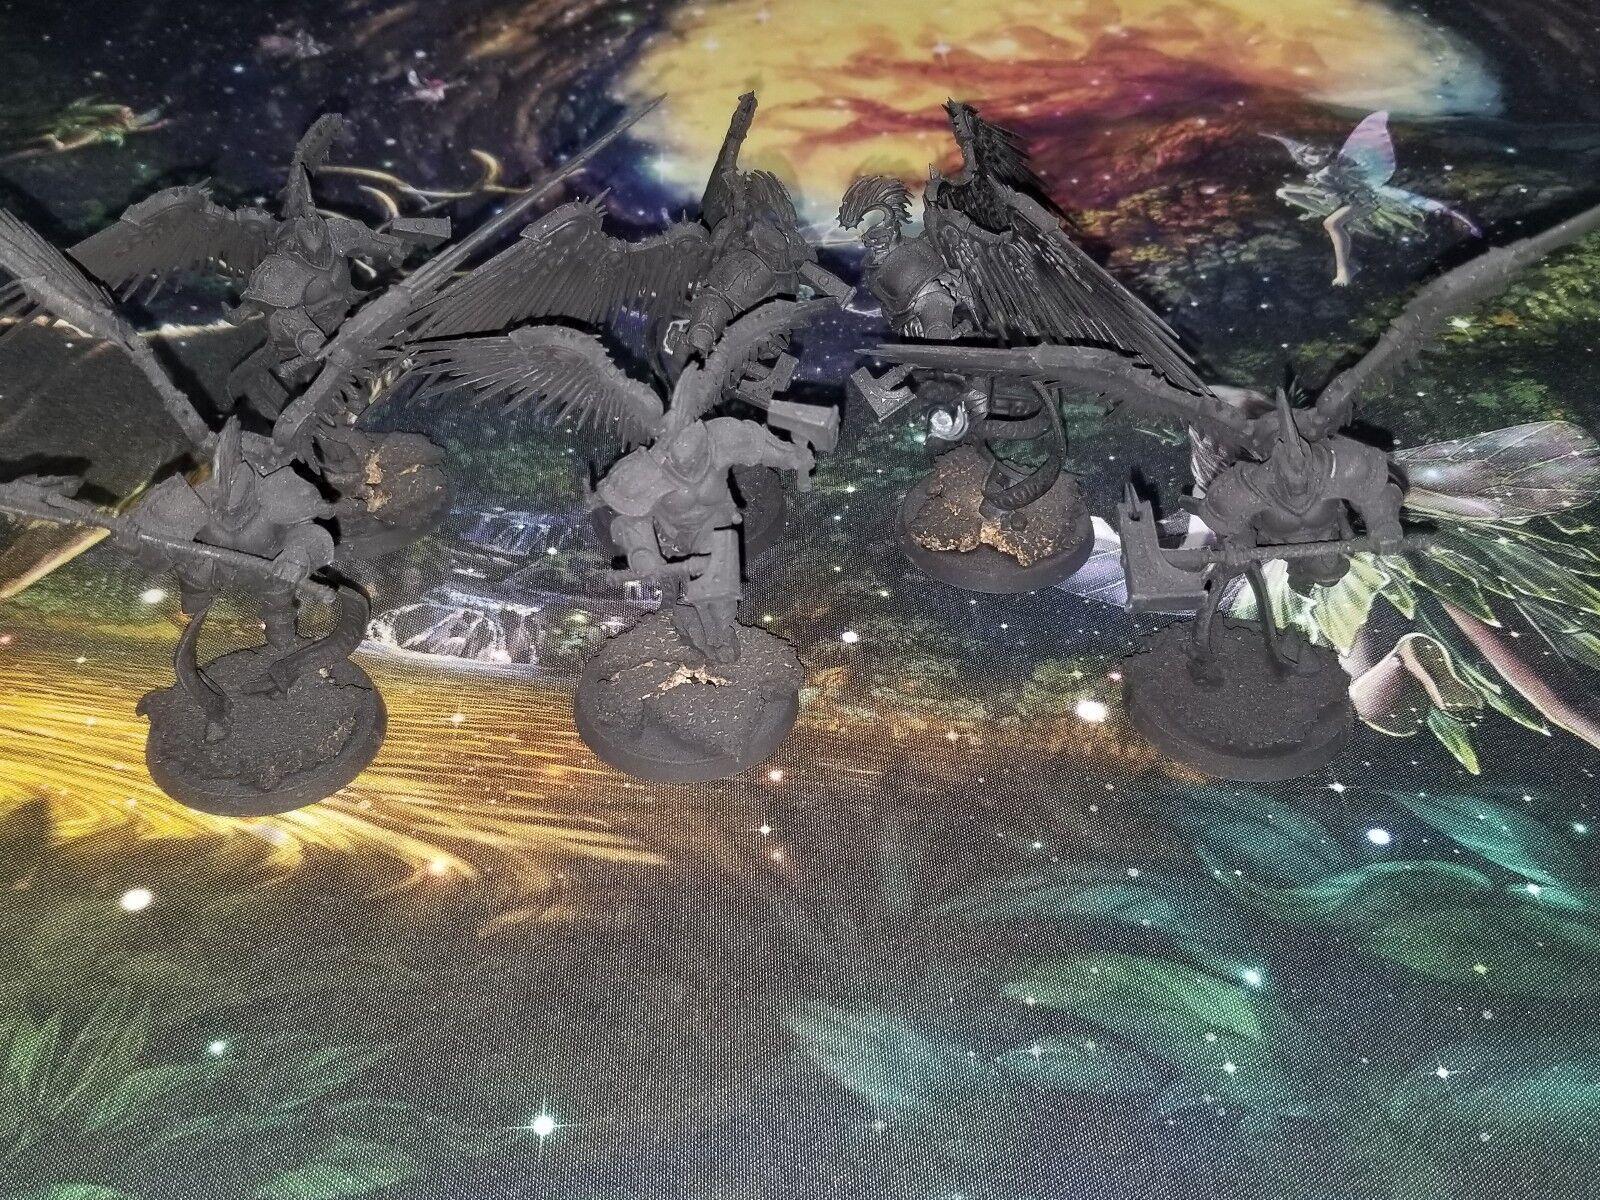 Warhammer 40k Ppinkcutors with Celestial Hammers J&R